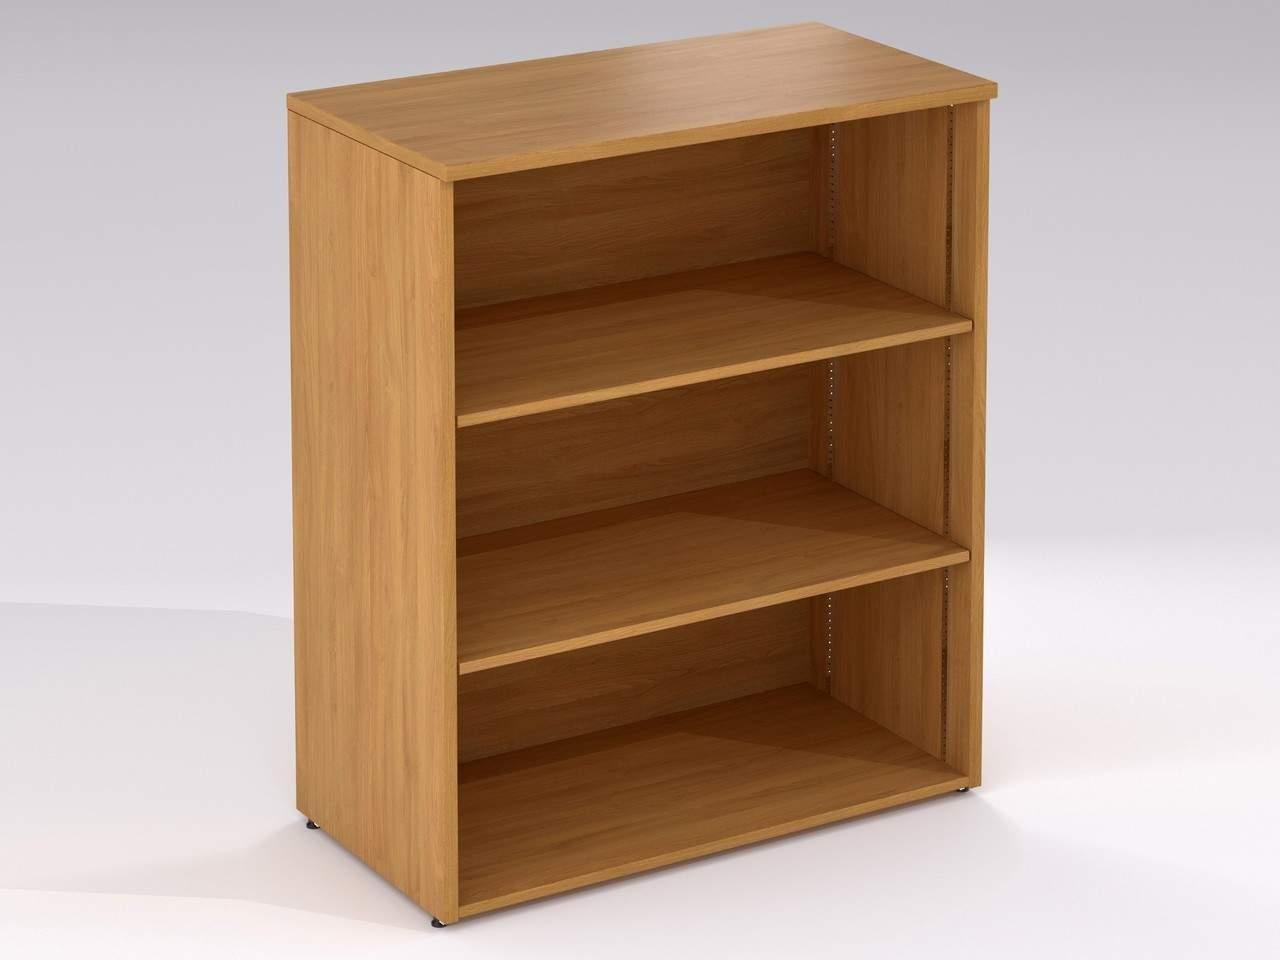 TCS 100cm Tall Bookcase